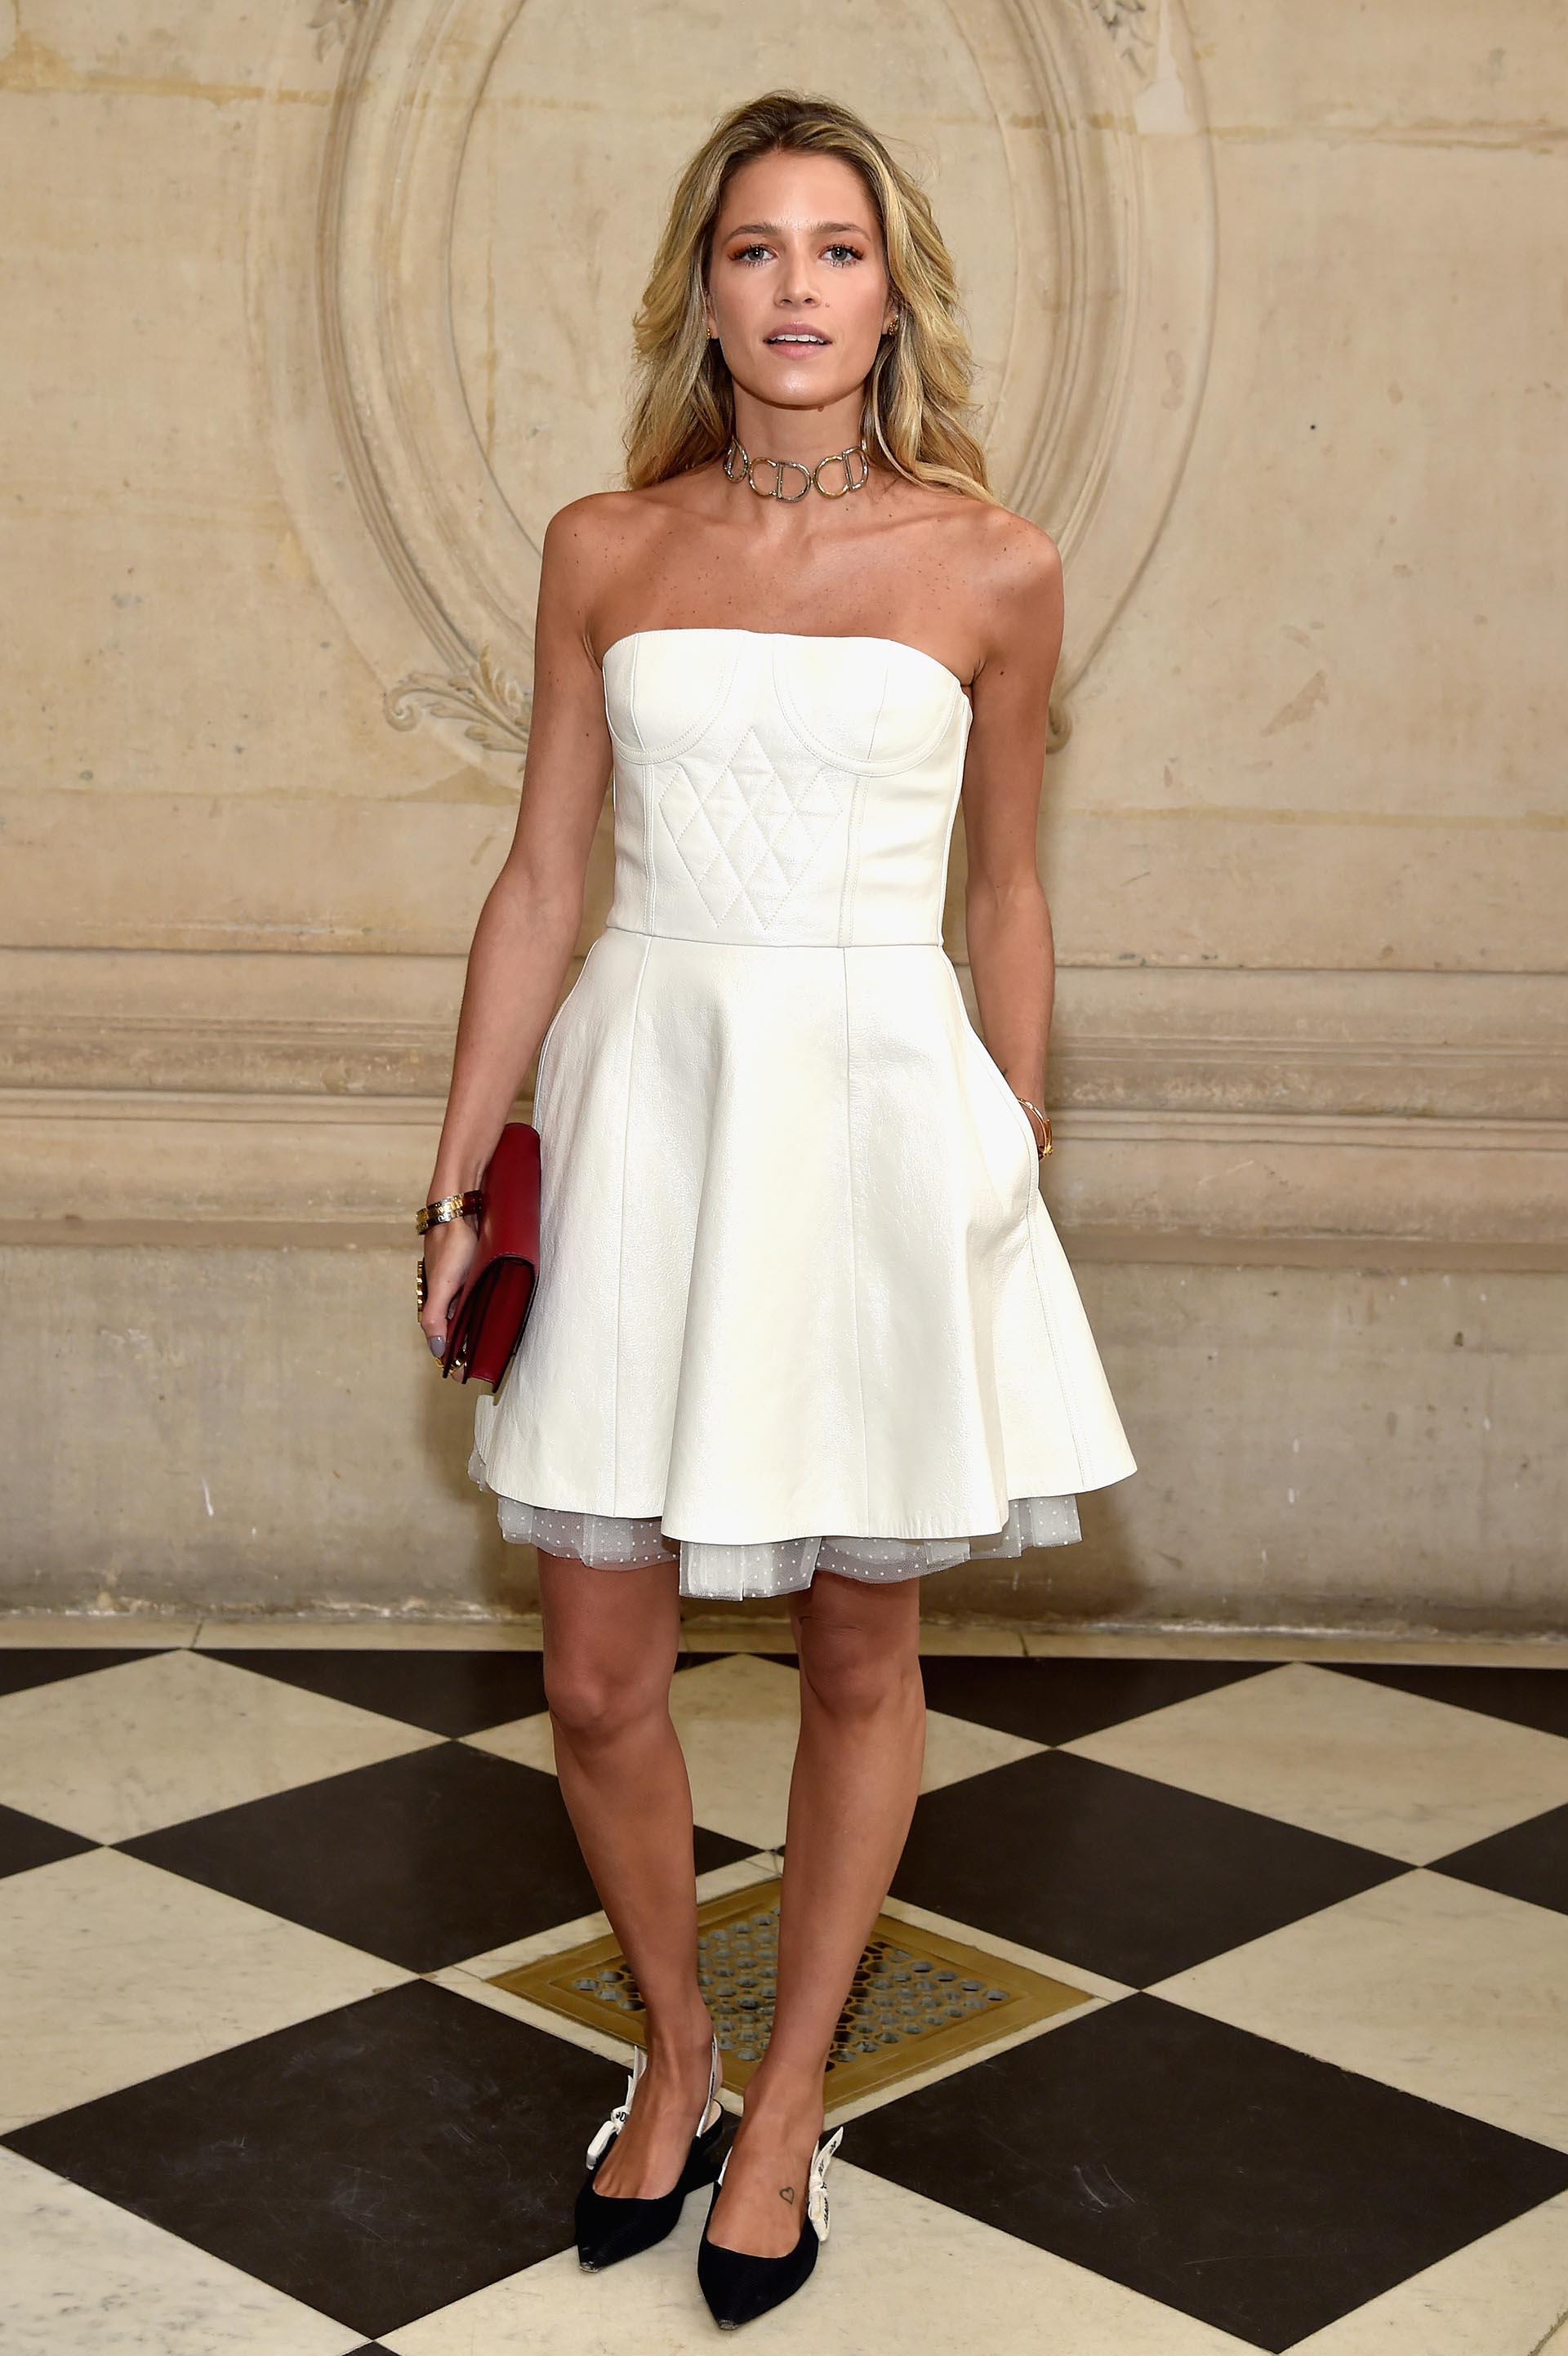 Helena Bordon impactó con este vestido blanco strapless